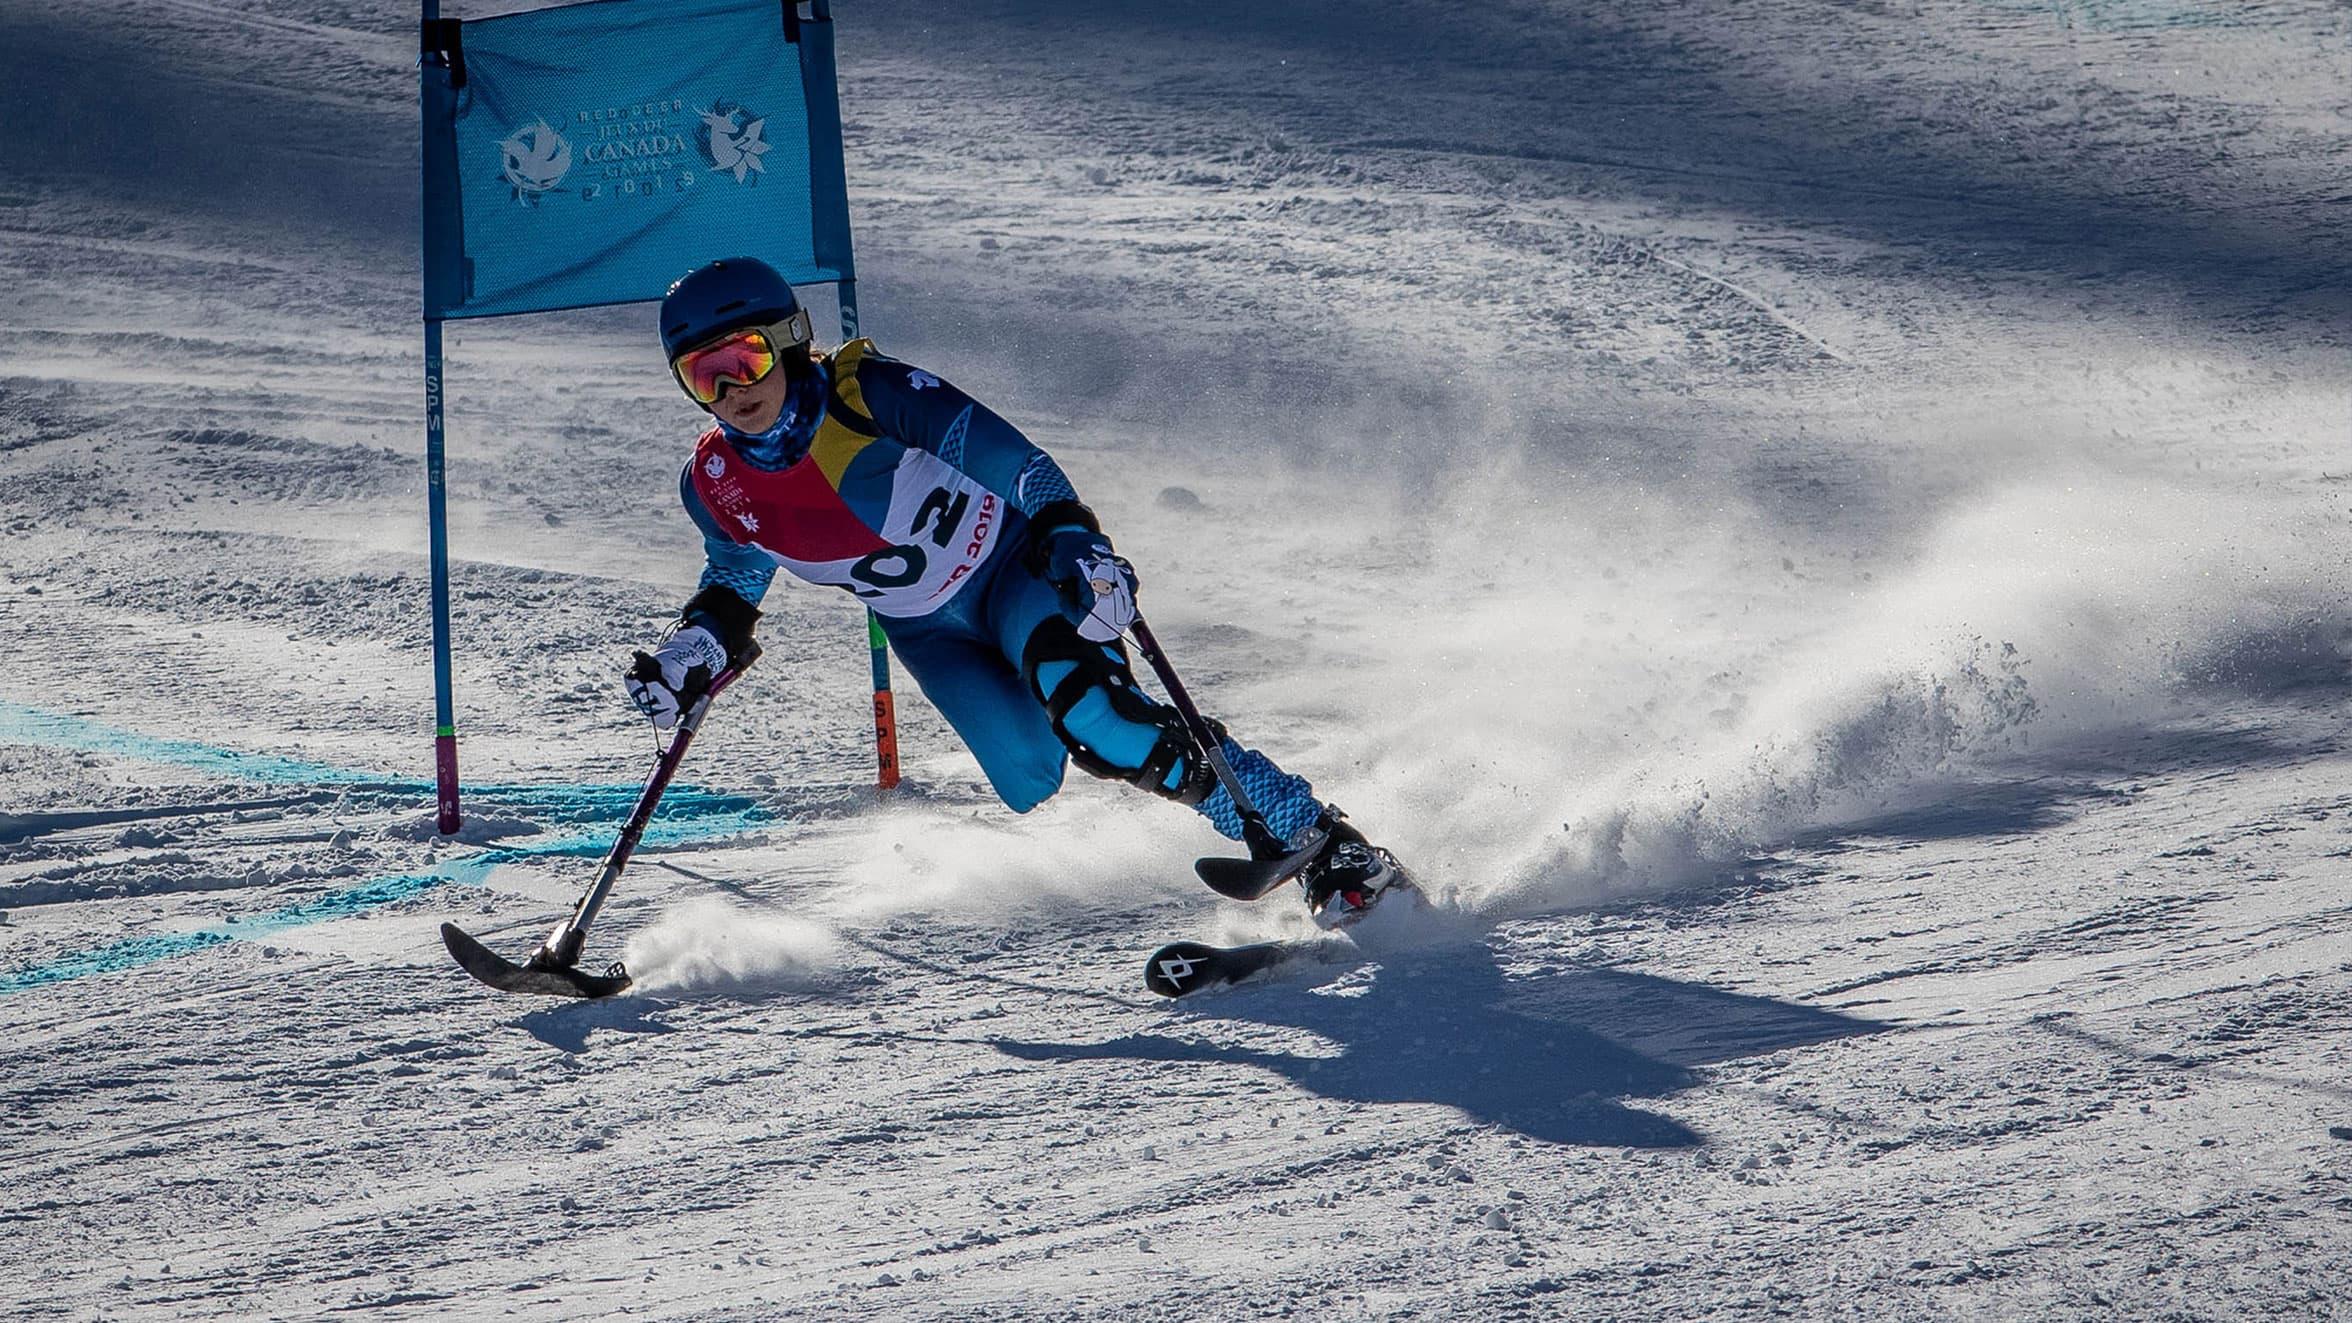 ParaAlpine skier Tess Beasant